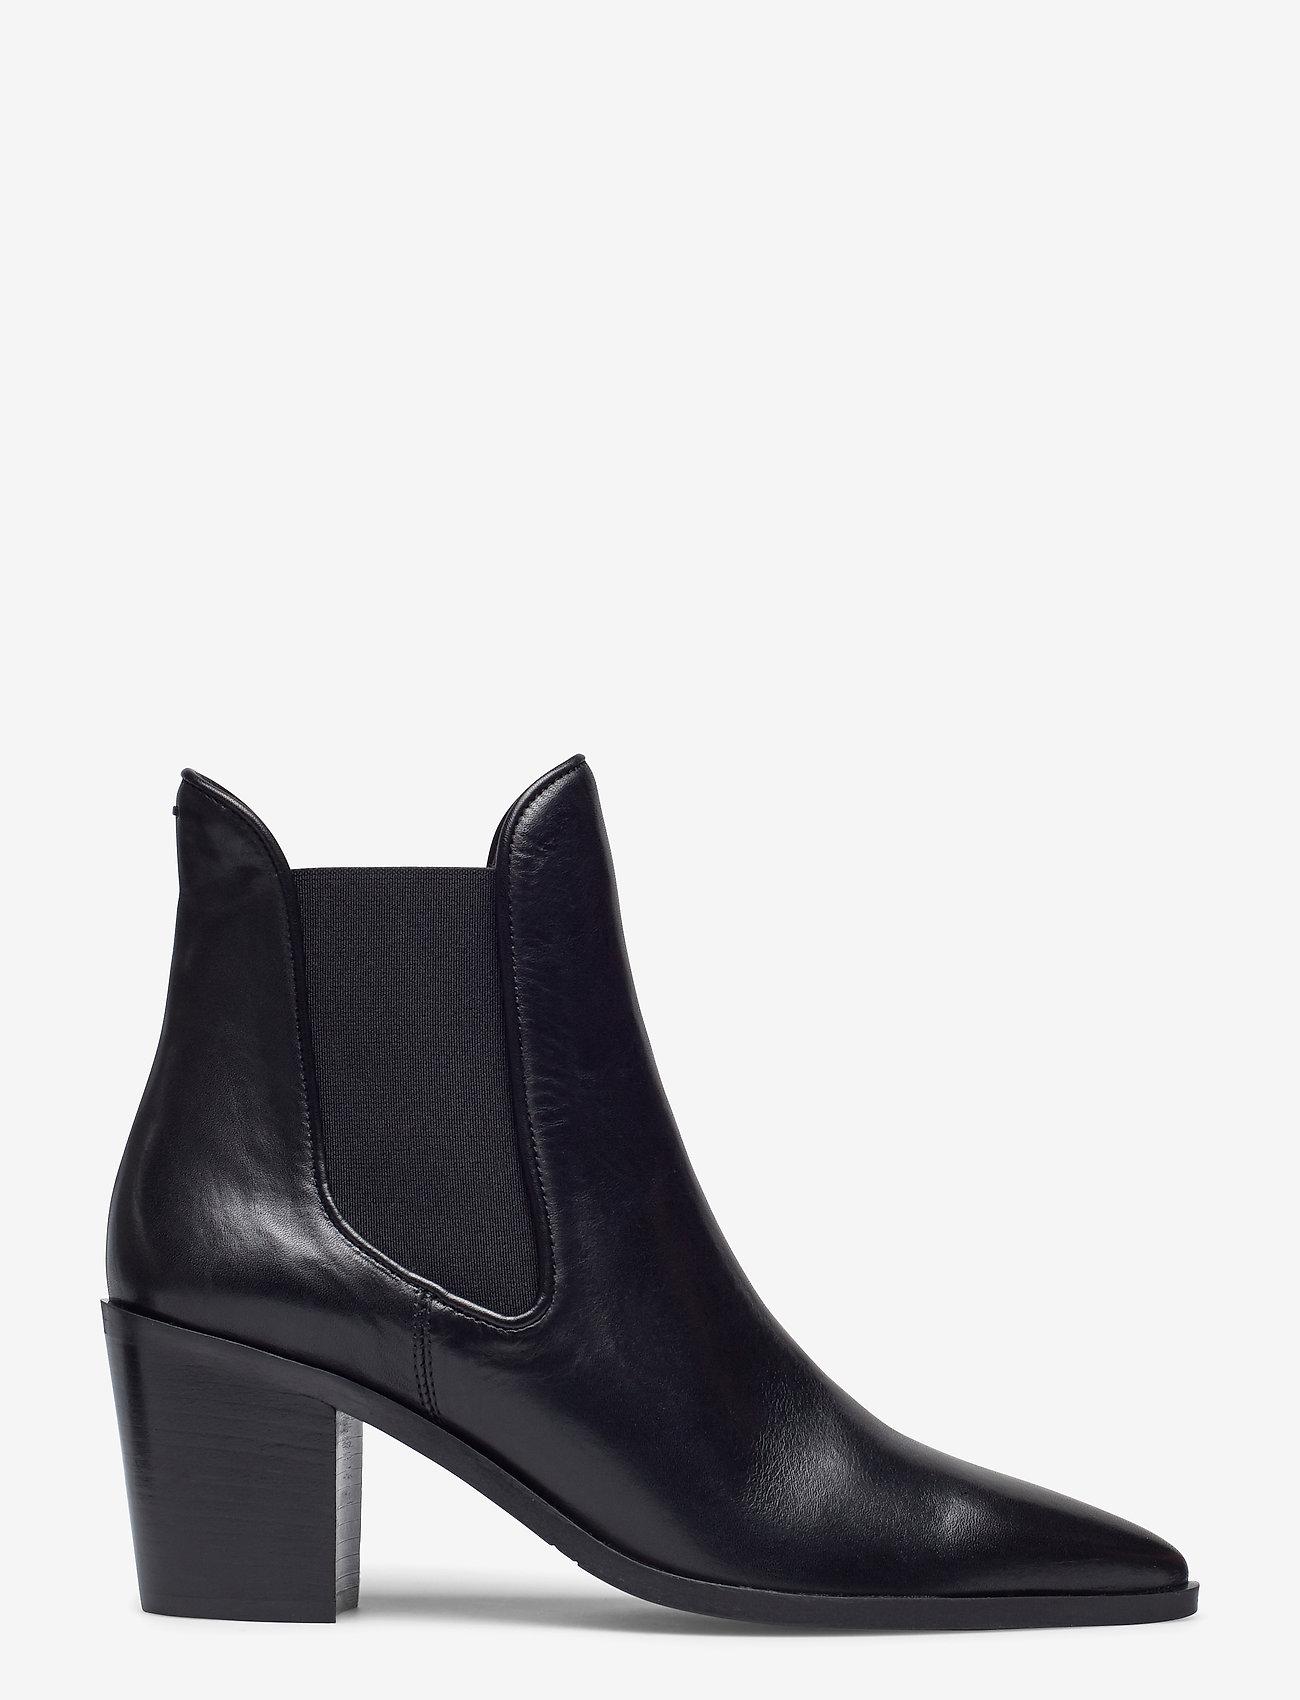 Boots 4942 (Black Calf 80) - Billi Bi oDrR6j